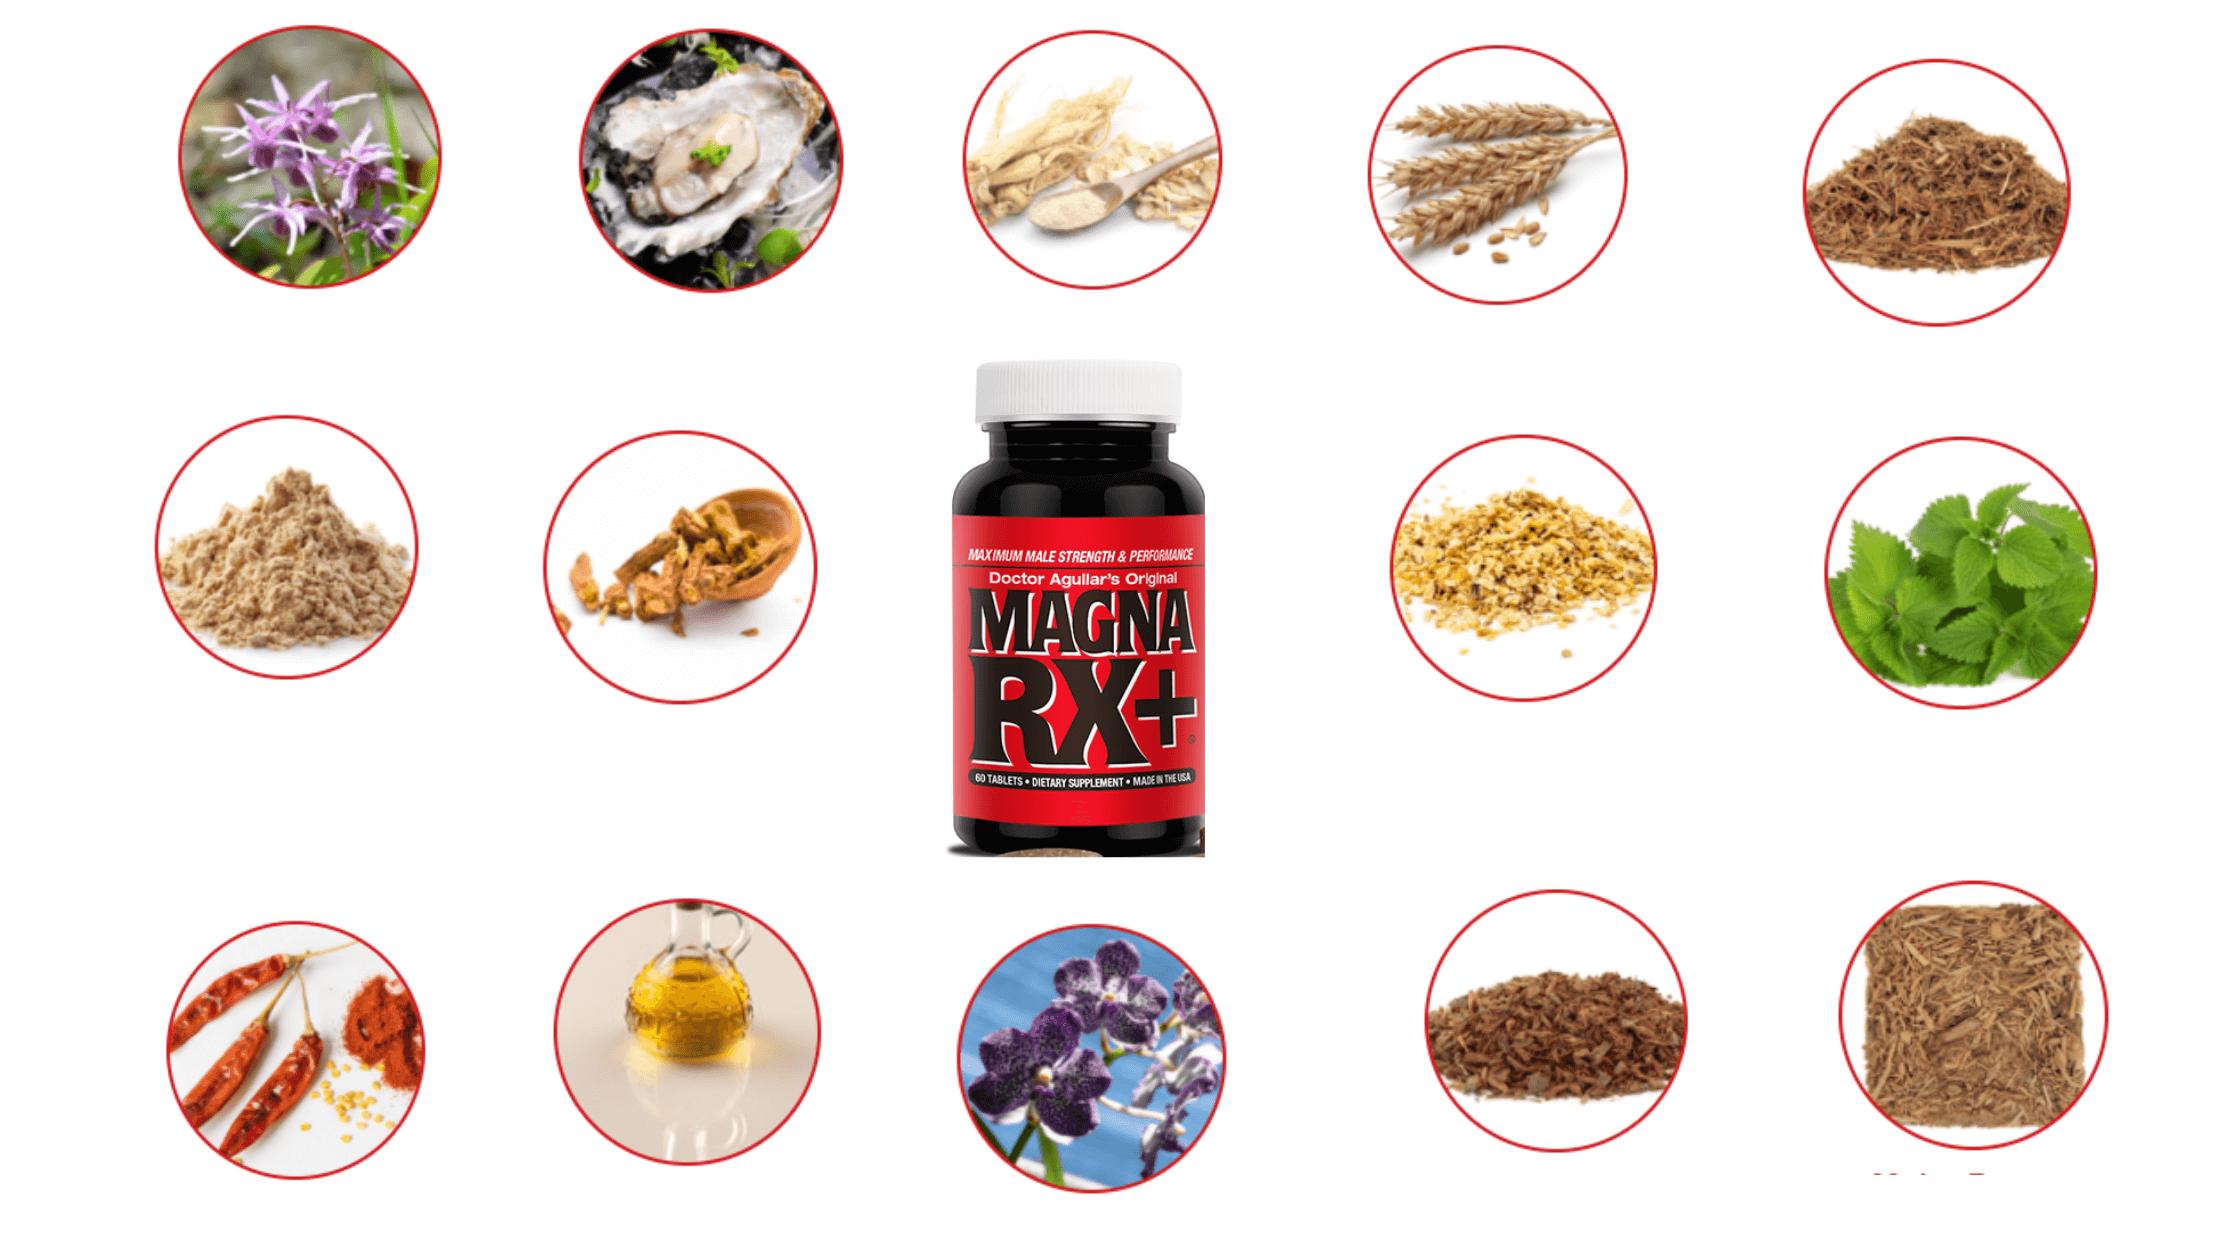 Magna RX Plus Ingredients